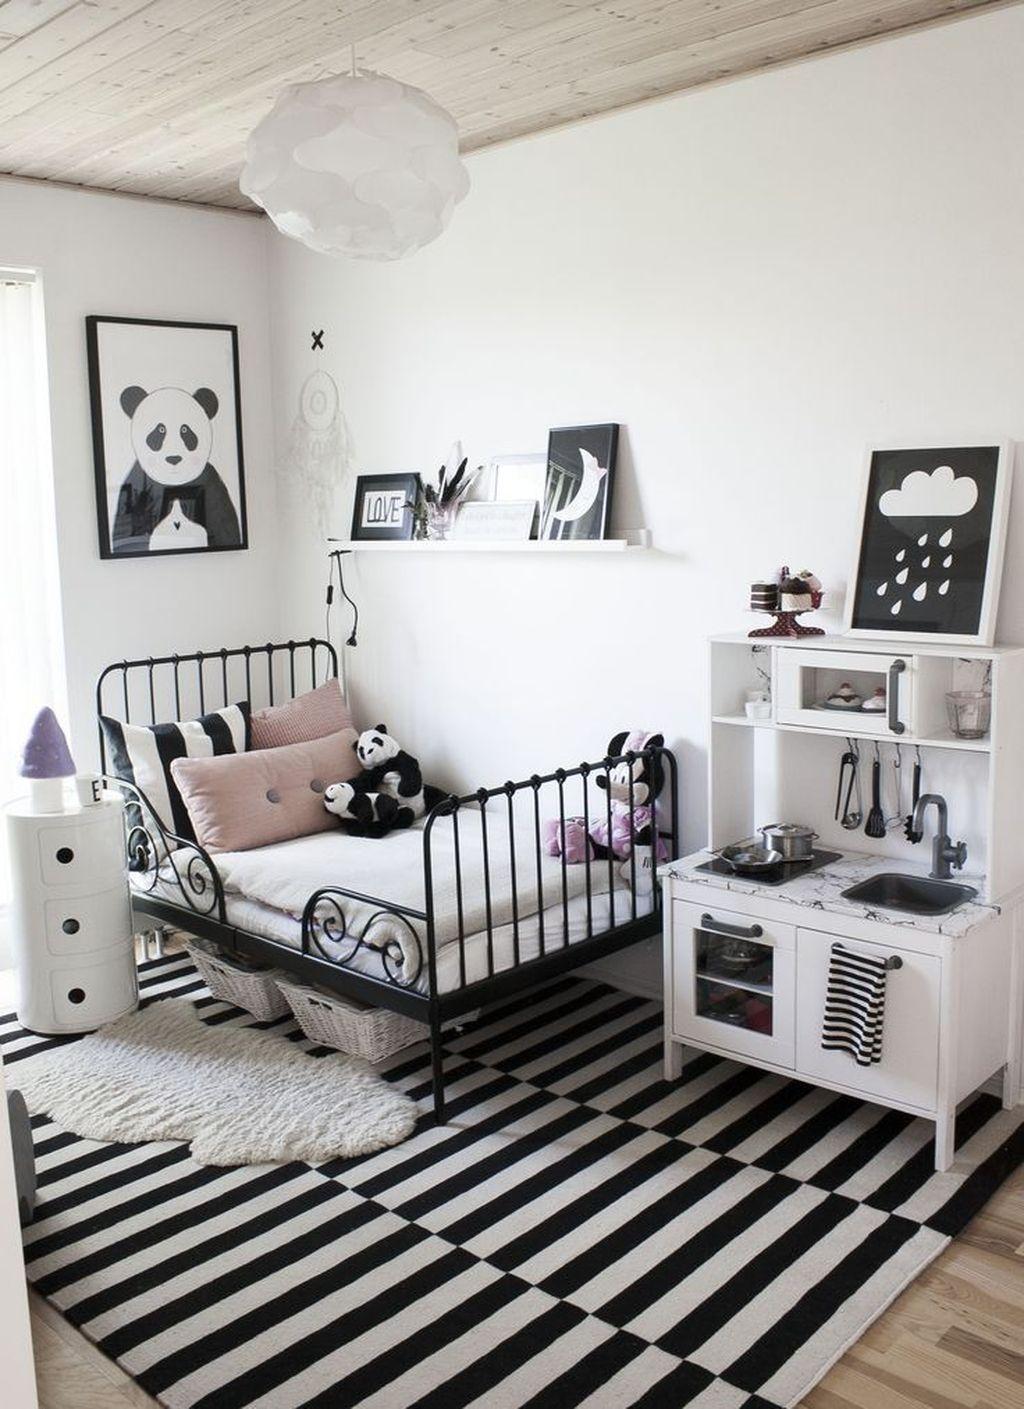 60+ Best Stylish Black And White Bedroom Ideas | White ...